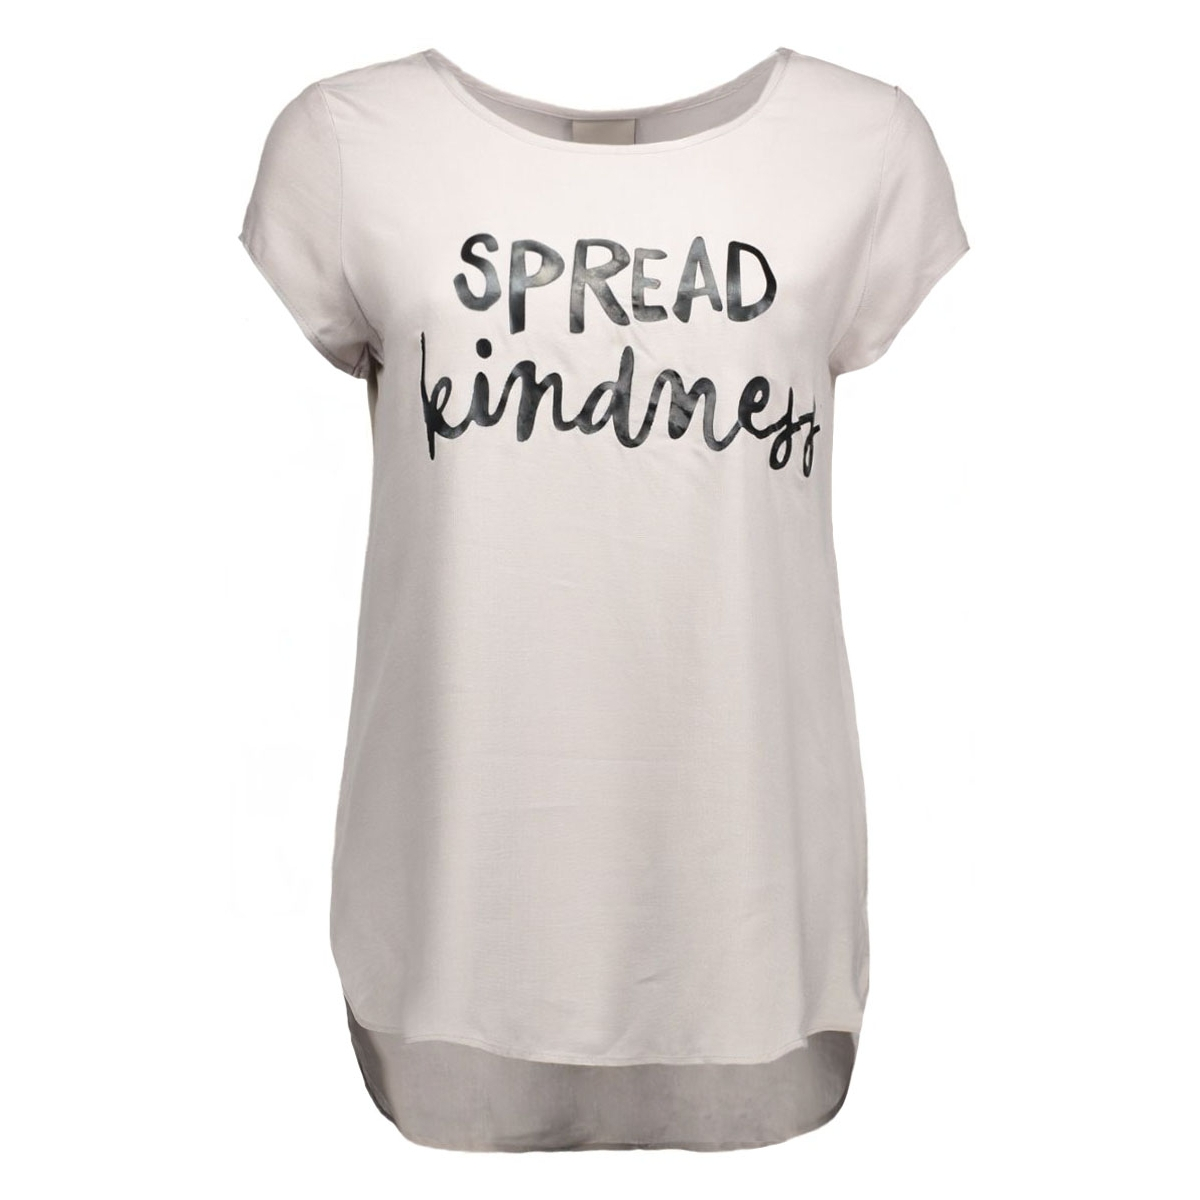 vmboca ss blouse printed 10128072 vero moda t-shirt ash/spread kin